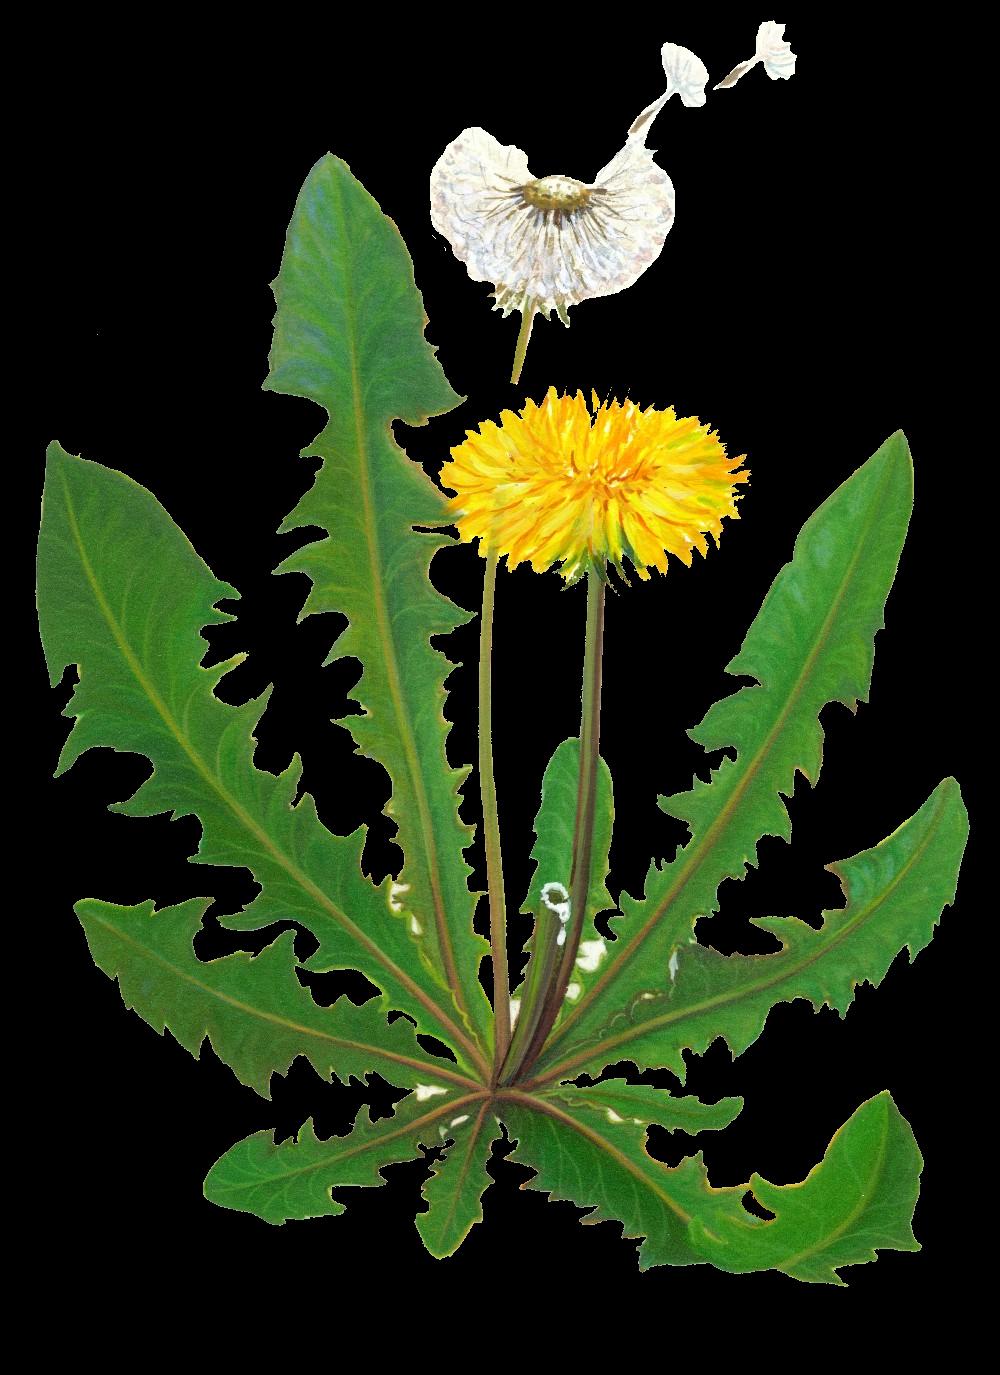 garden weeds clipart - photo #24